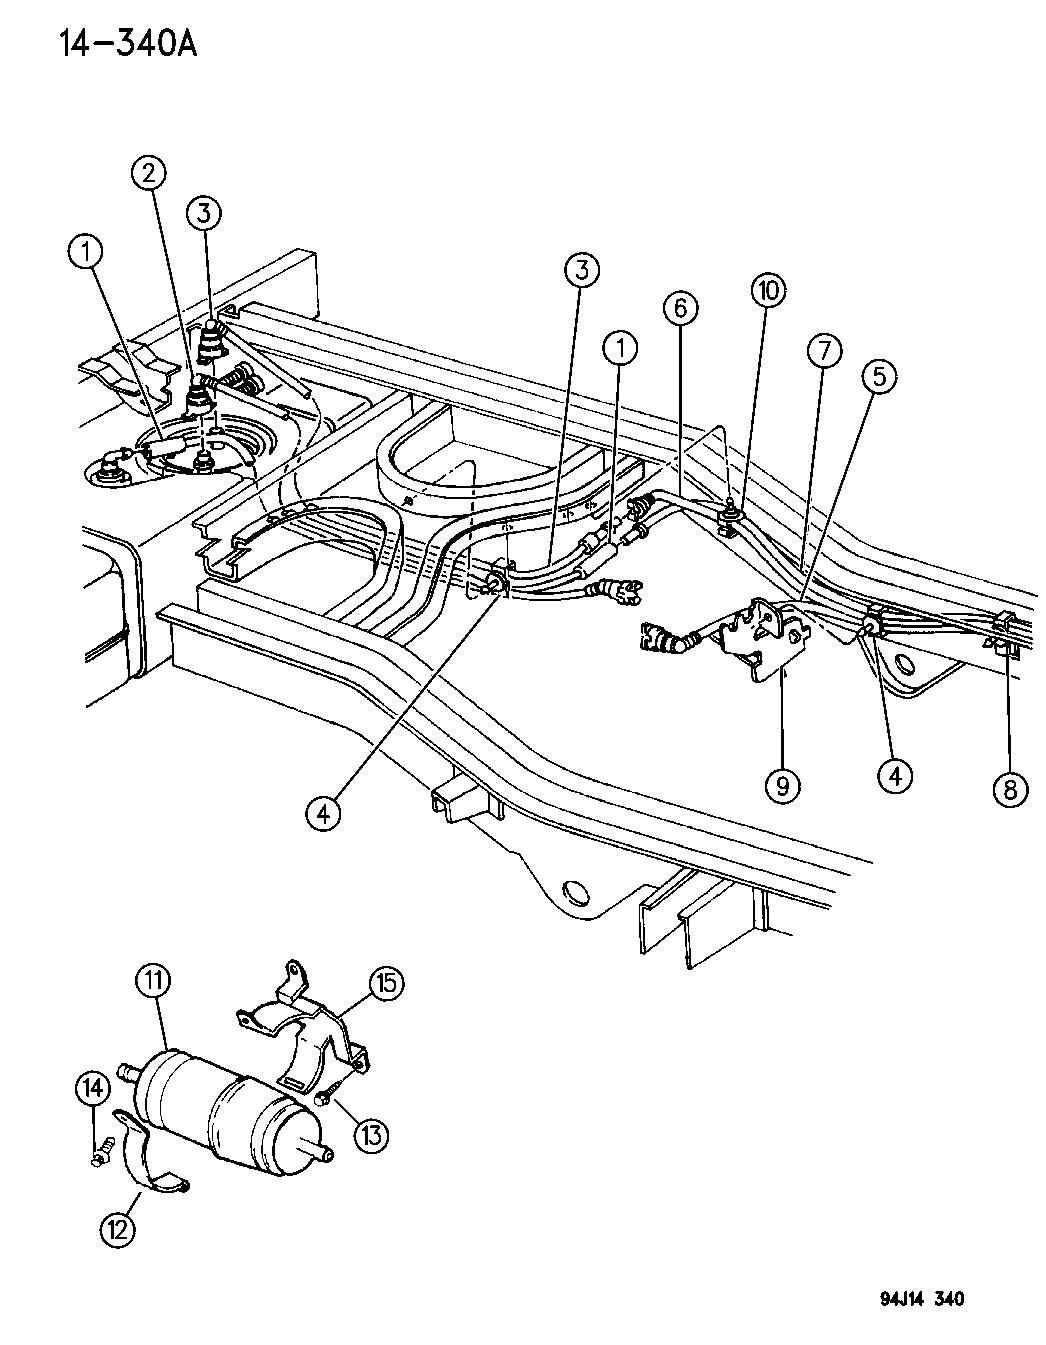 1996 jeep grand cherokee fuel lines, rear